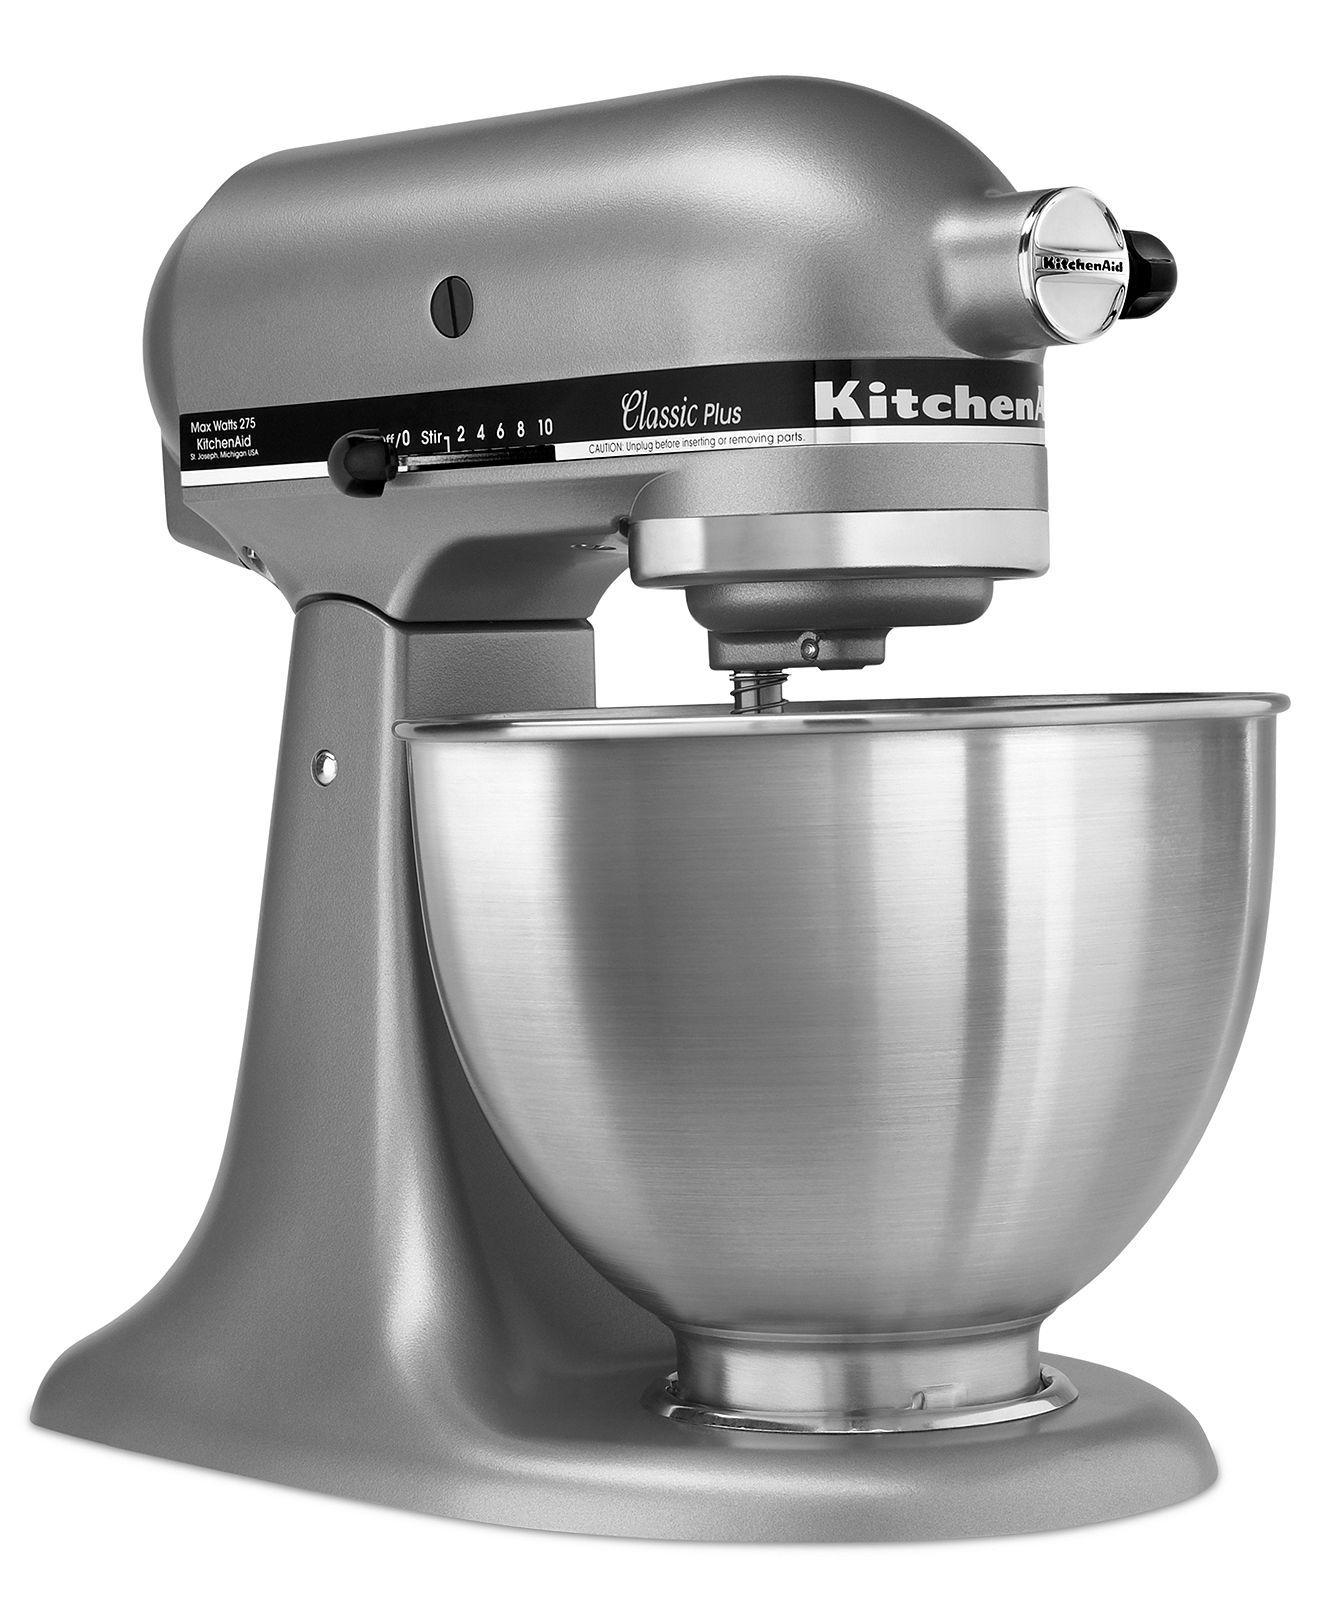 4.5 Qt. Classic Plus Stand Mixer KSM75 Kitchenaid